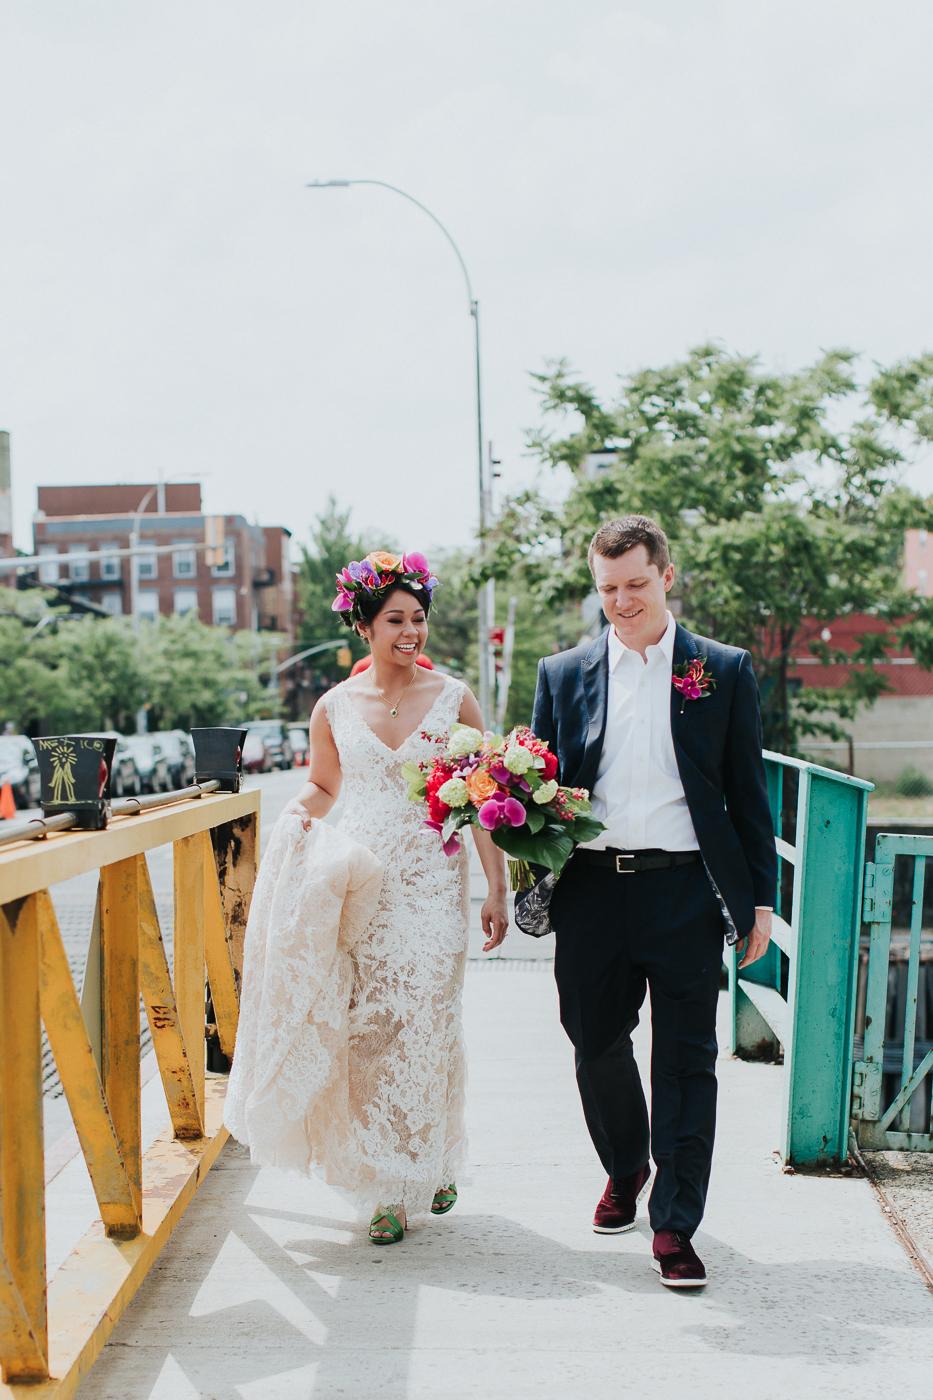 501-Union-Brooklyn-Documentary-Wedding-Photographer-27.jpg